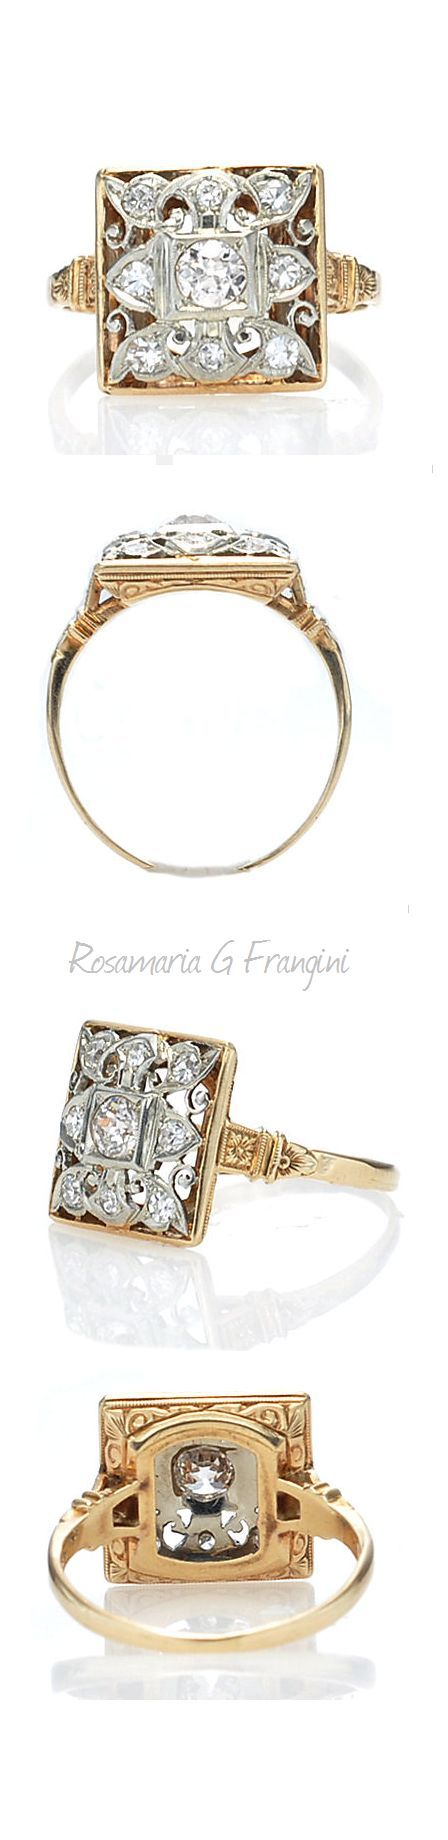 rubies.work/… 0498-sapphire-ring/ 0527-sapphire-ring/ High Jewellery Antique | TJS | Art Deco Diamond Ring